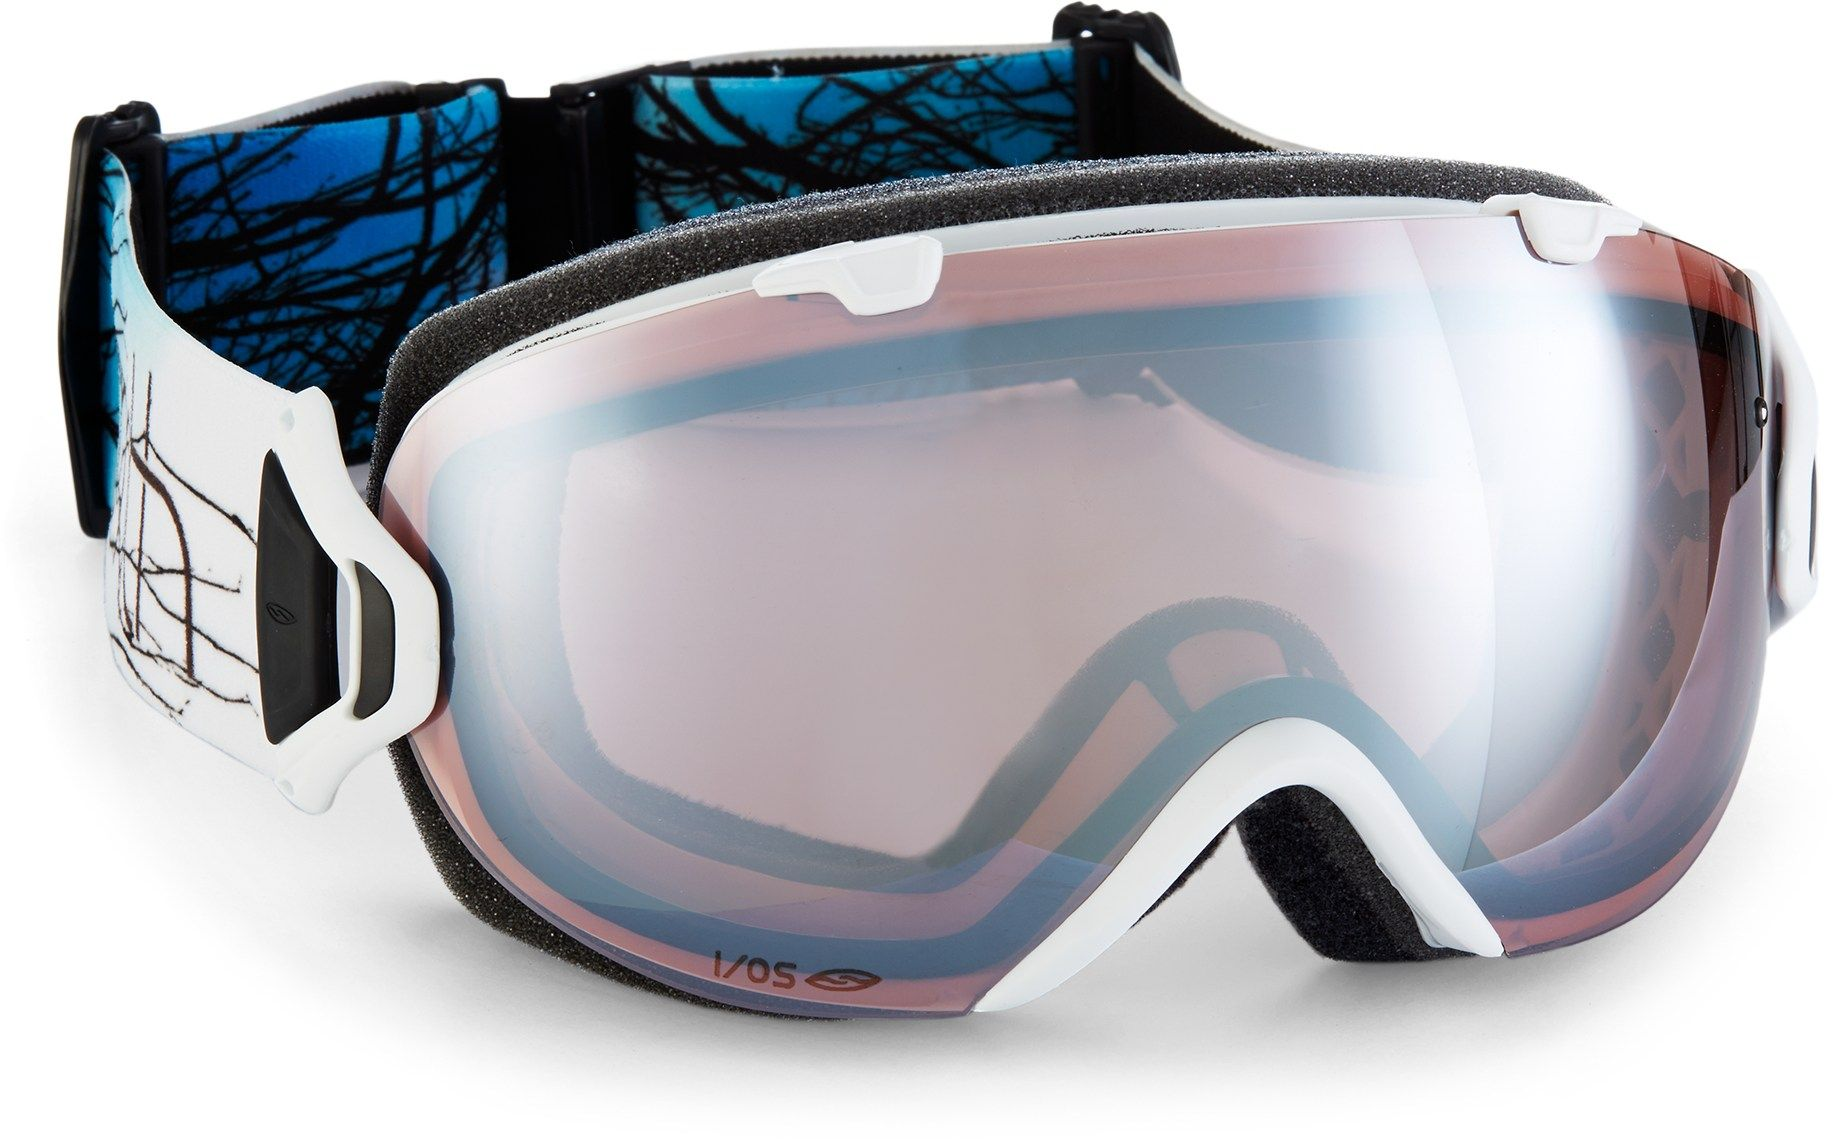 93a7c8cc0d16 Smith I OS Snow Goggles - Women s